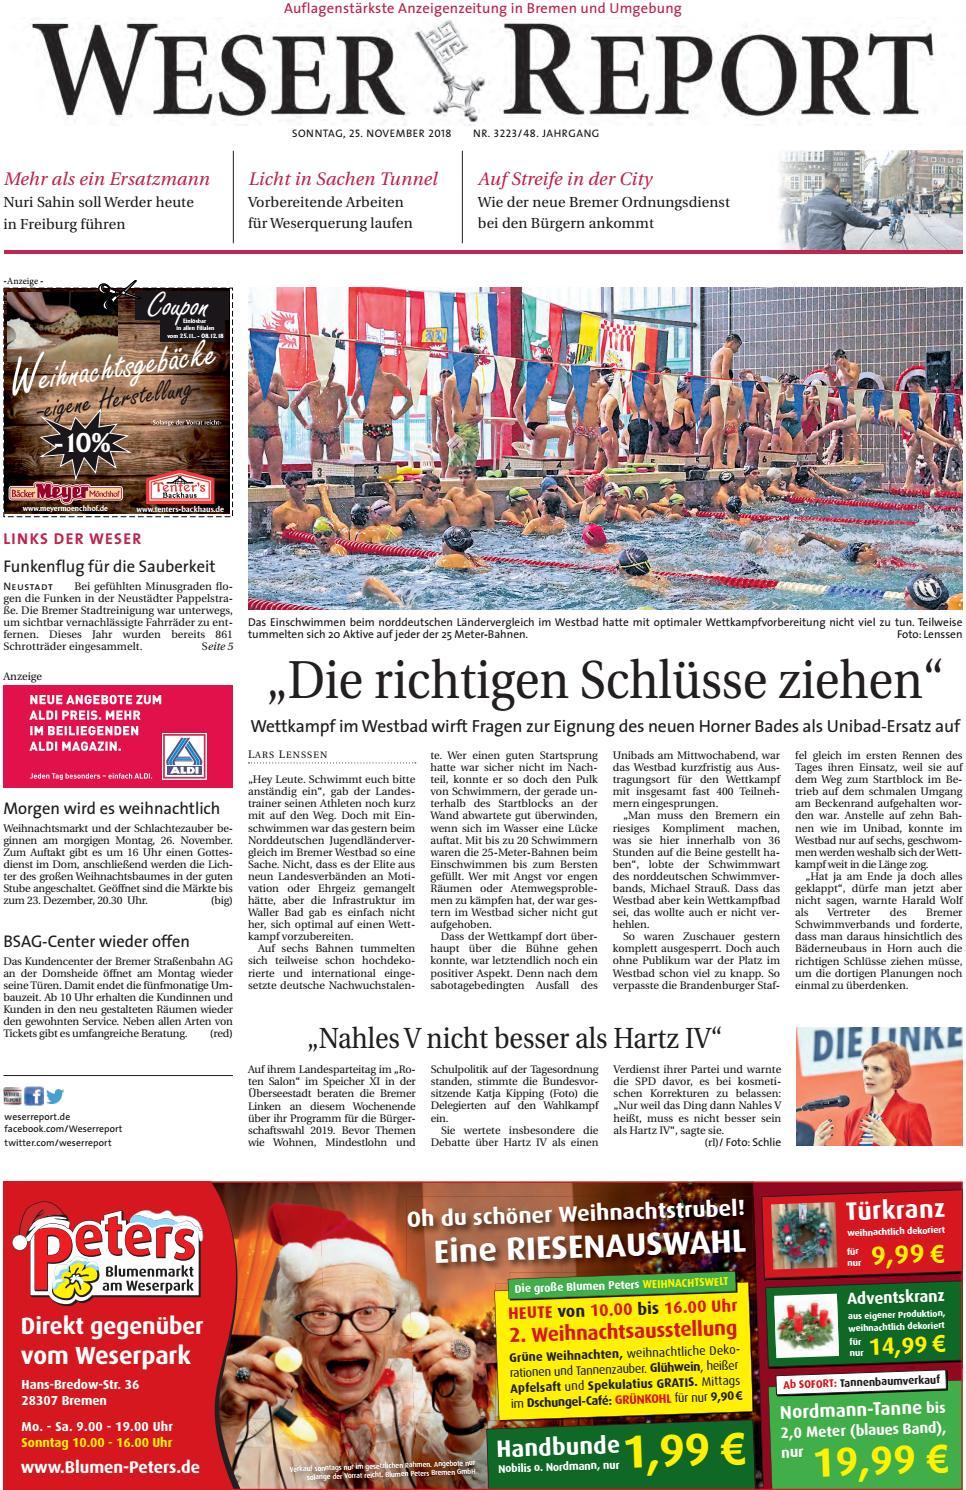 Weser Report - Links der Weser vom 25.11.2018 by KPS ...